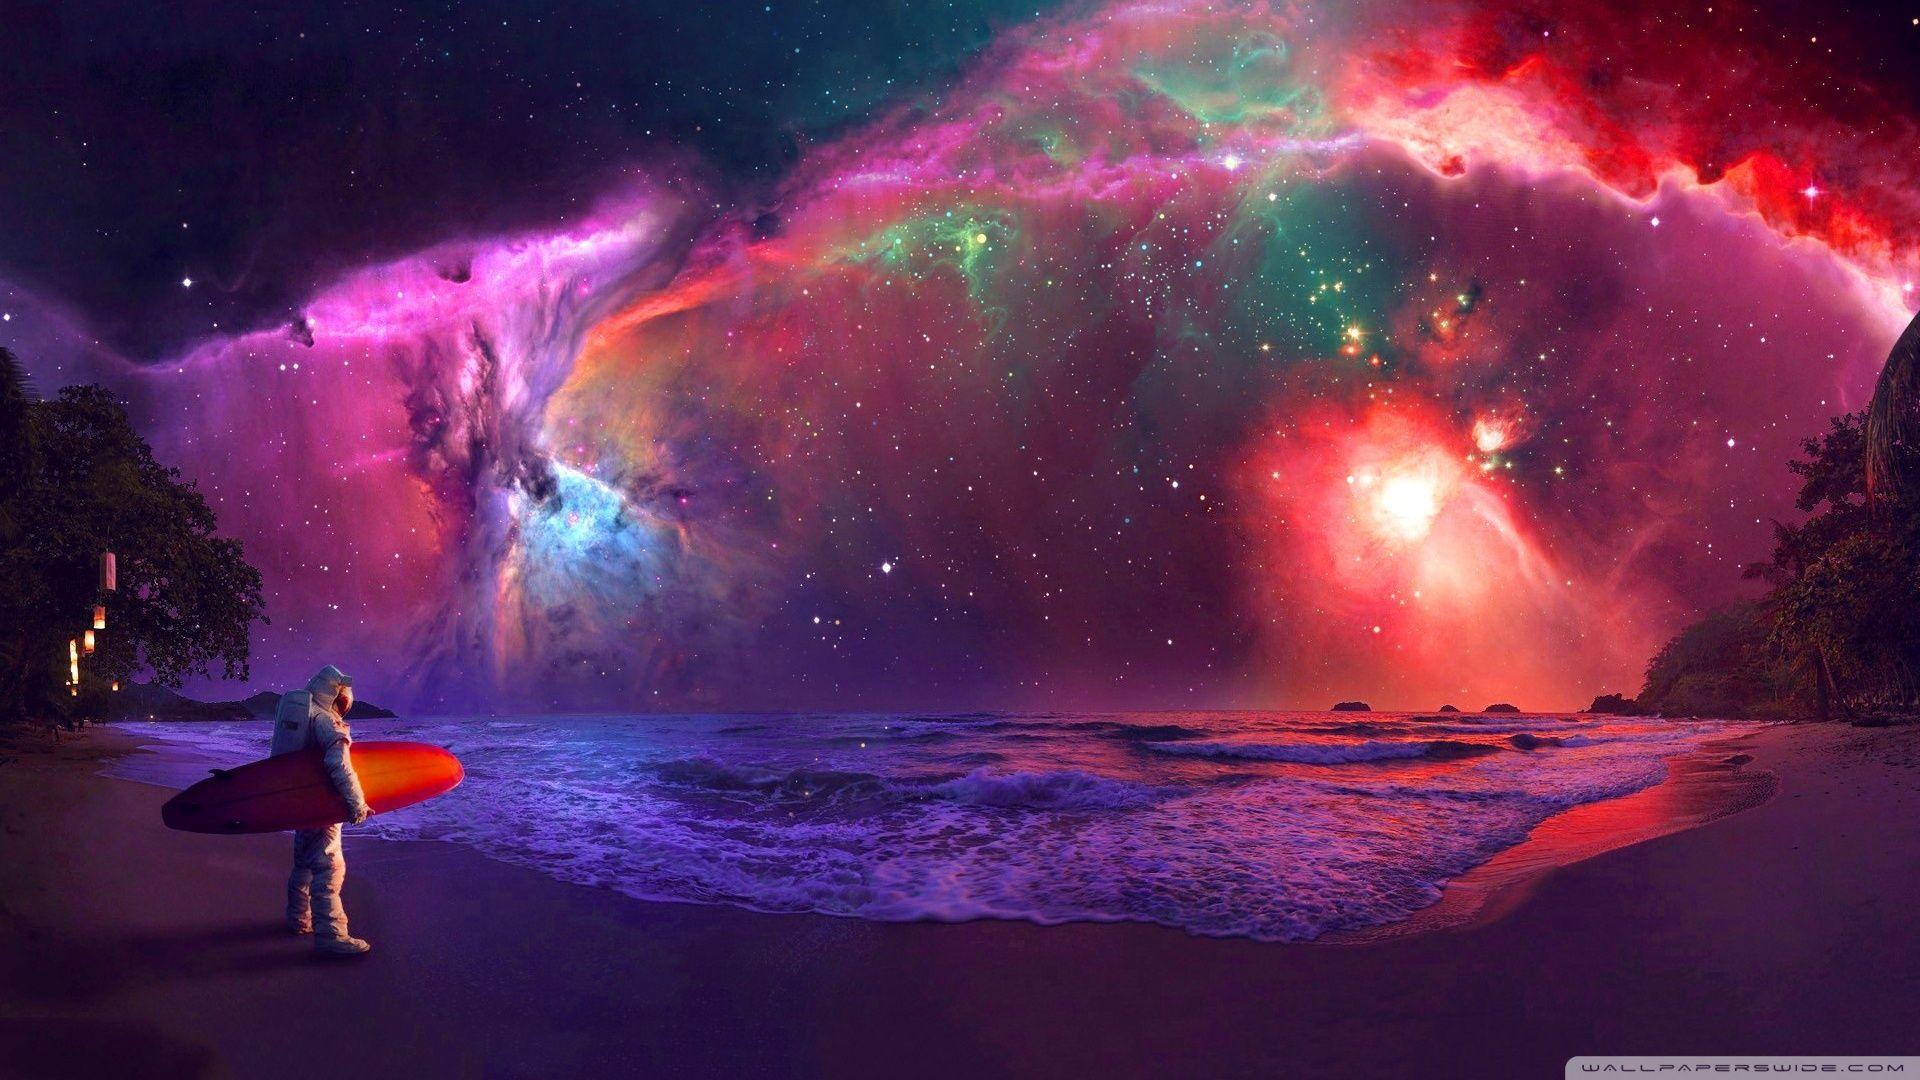 Astronaut Galaxy Wallpapers Top Free Astronaut Galaxy